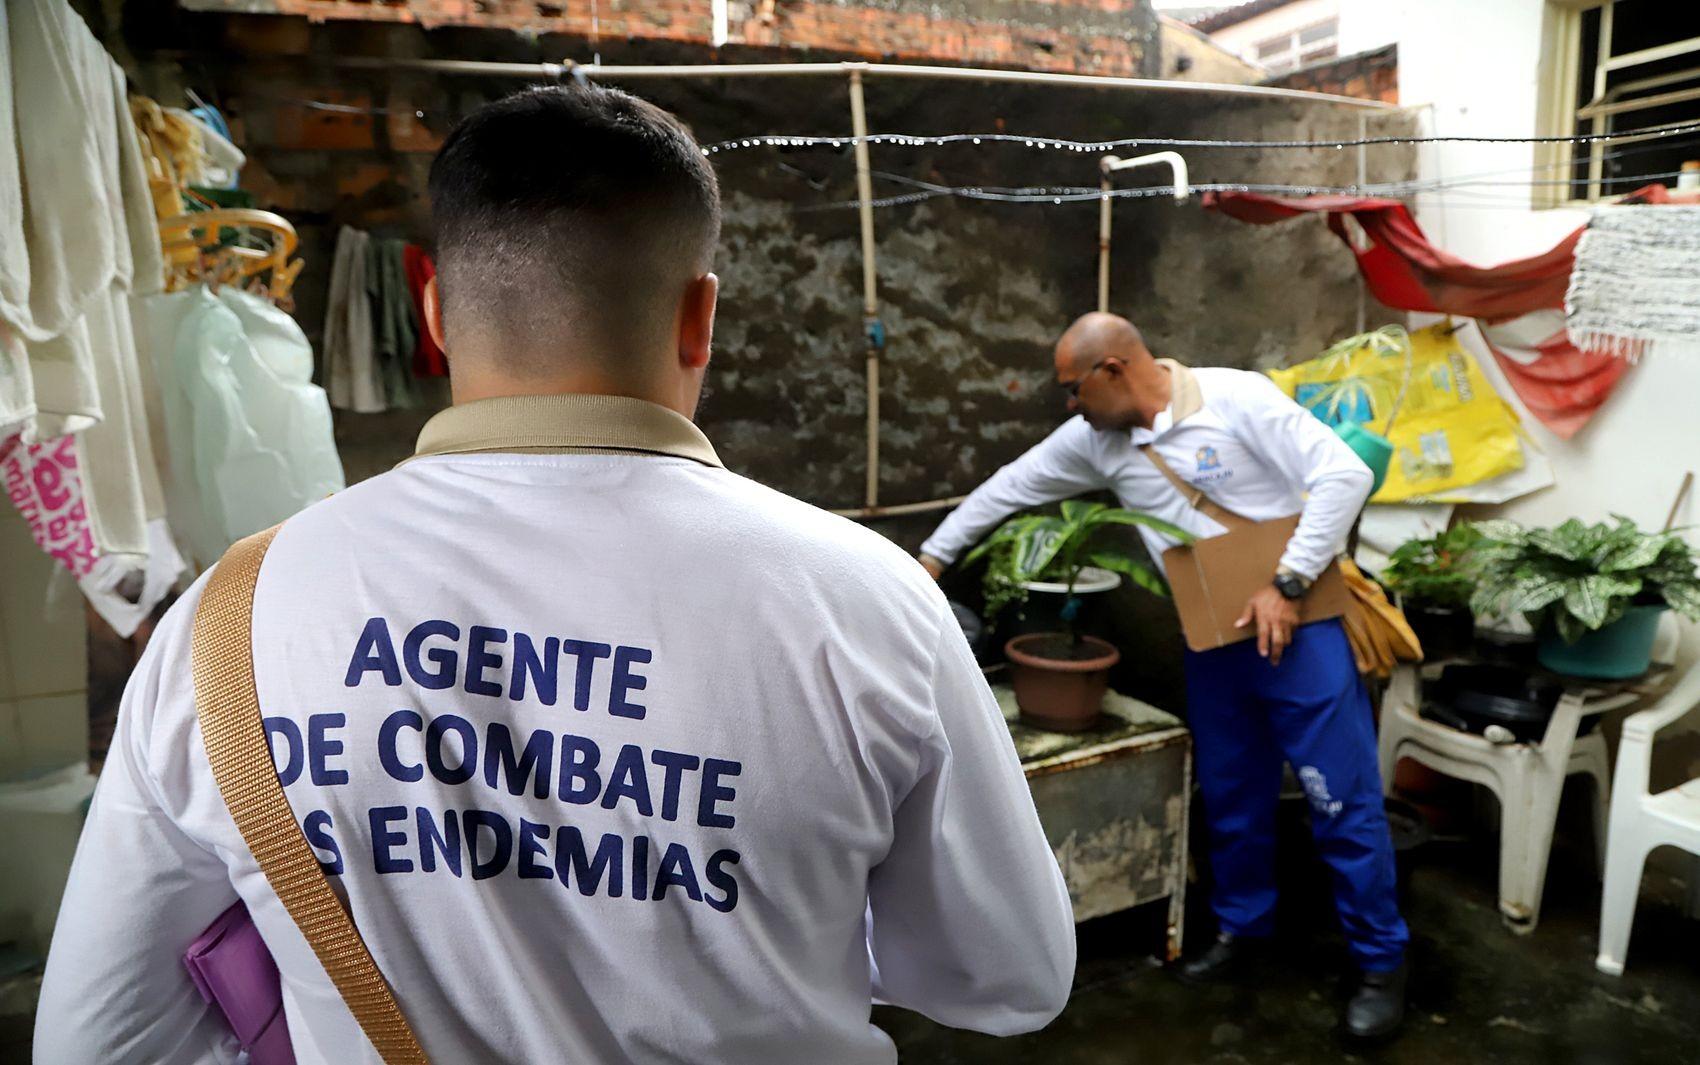 Secretaria da Saúde de Aracaju divulga cronograma de combate ao Aedes aegypti